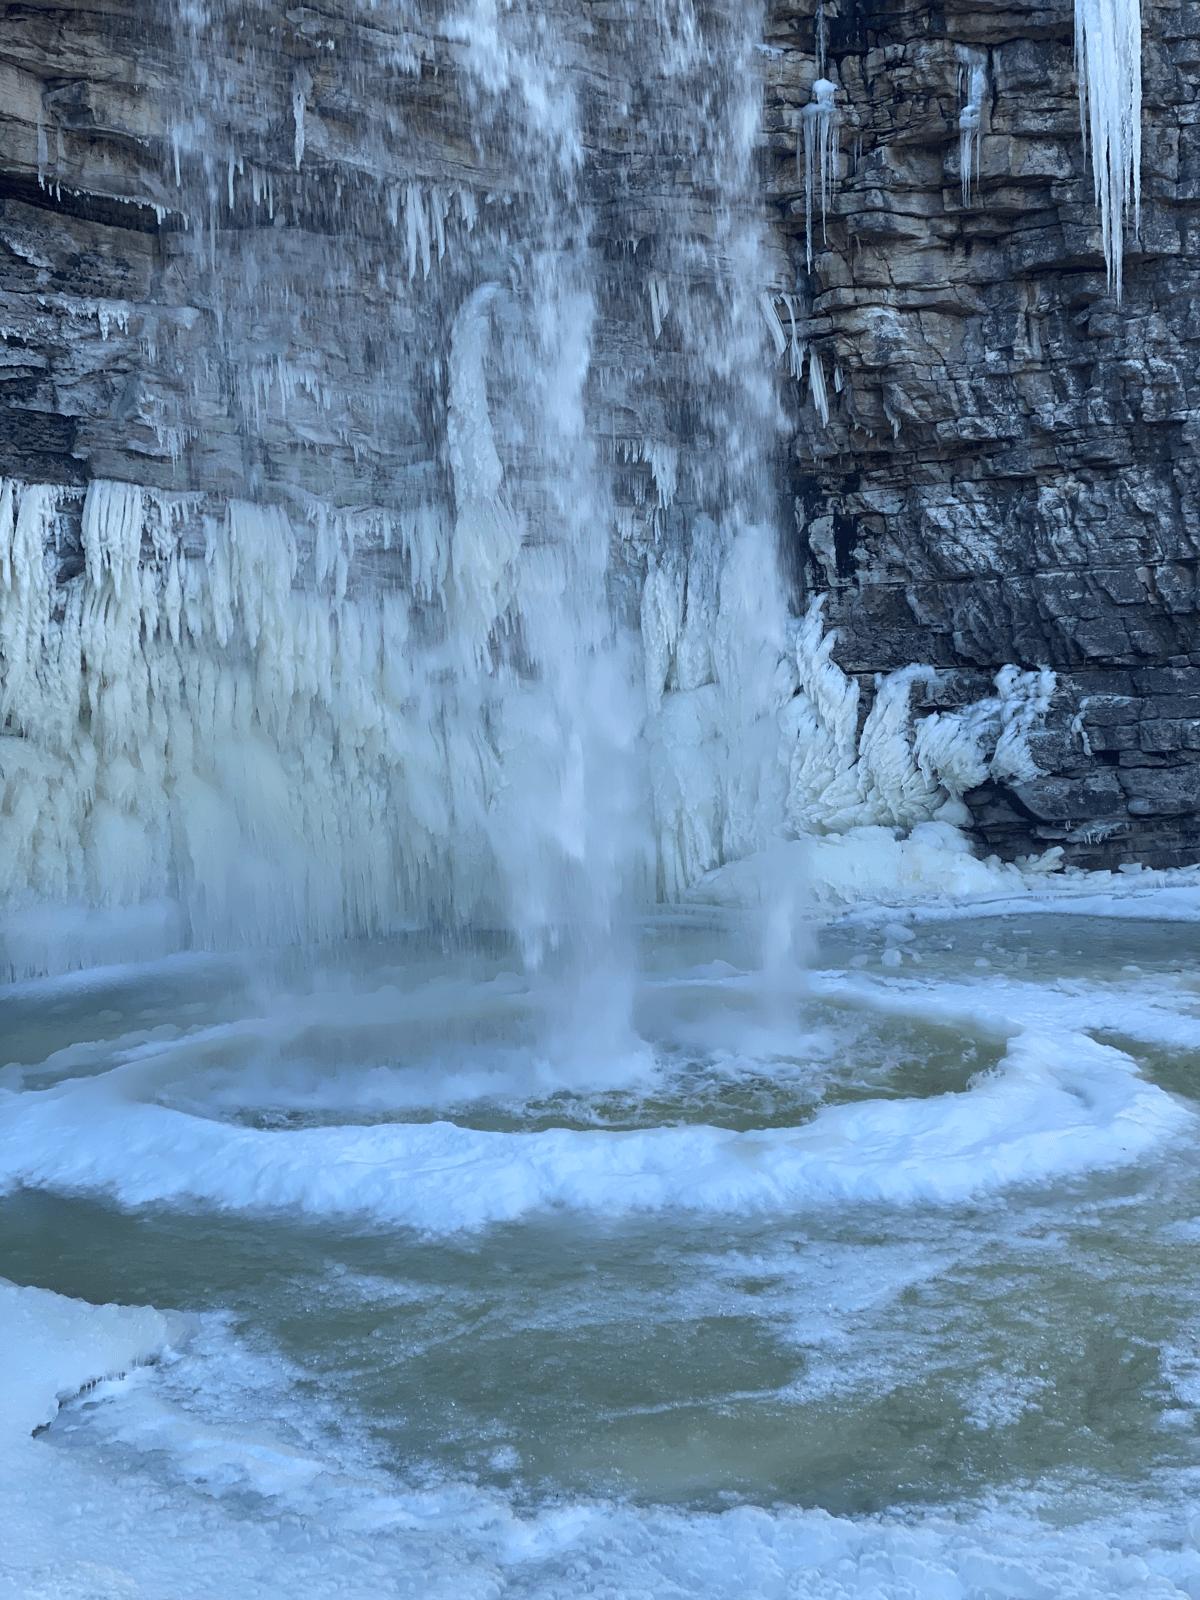 Awosting Falls pool